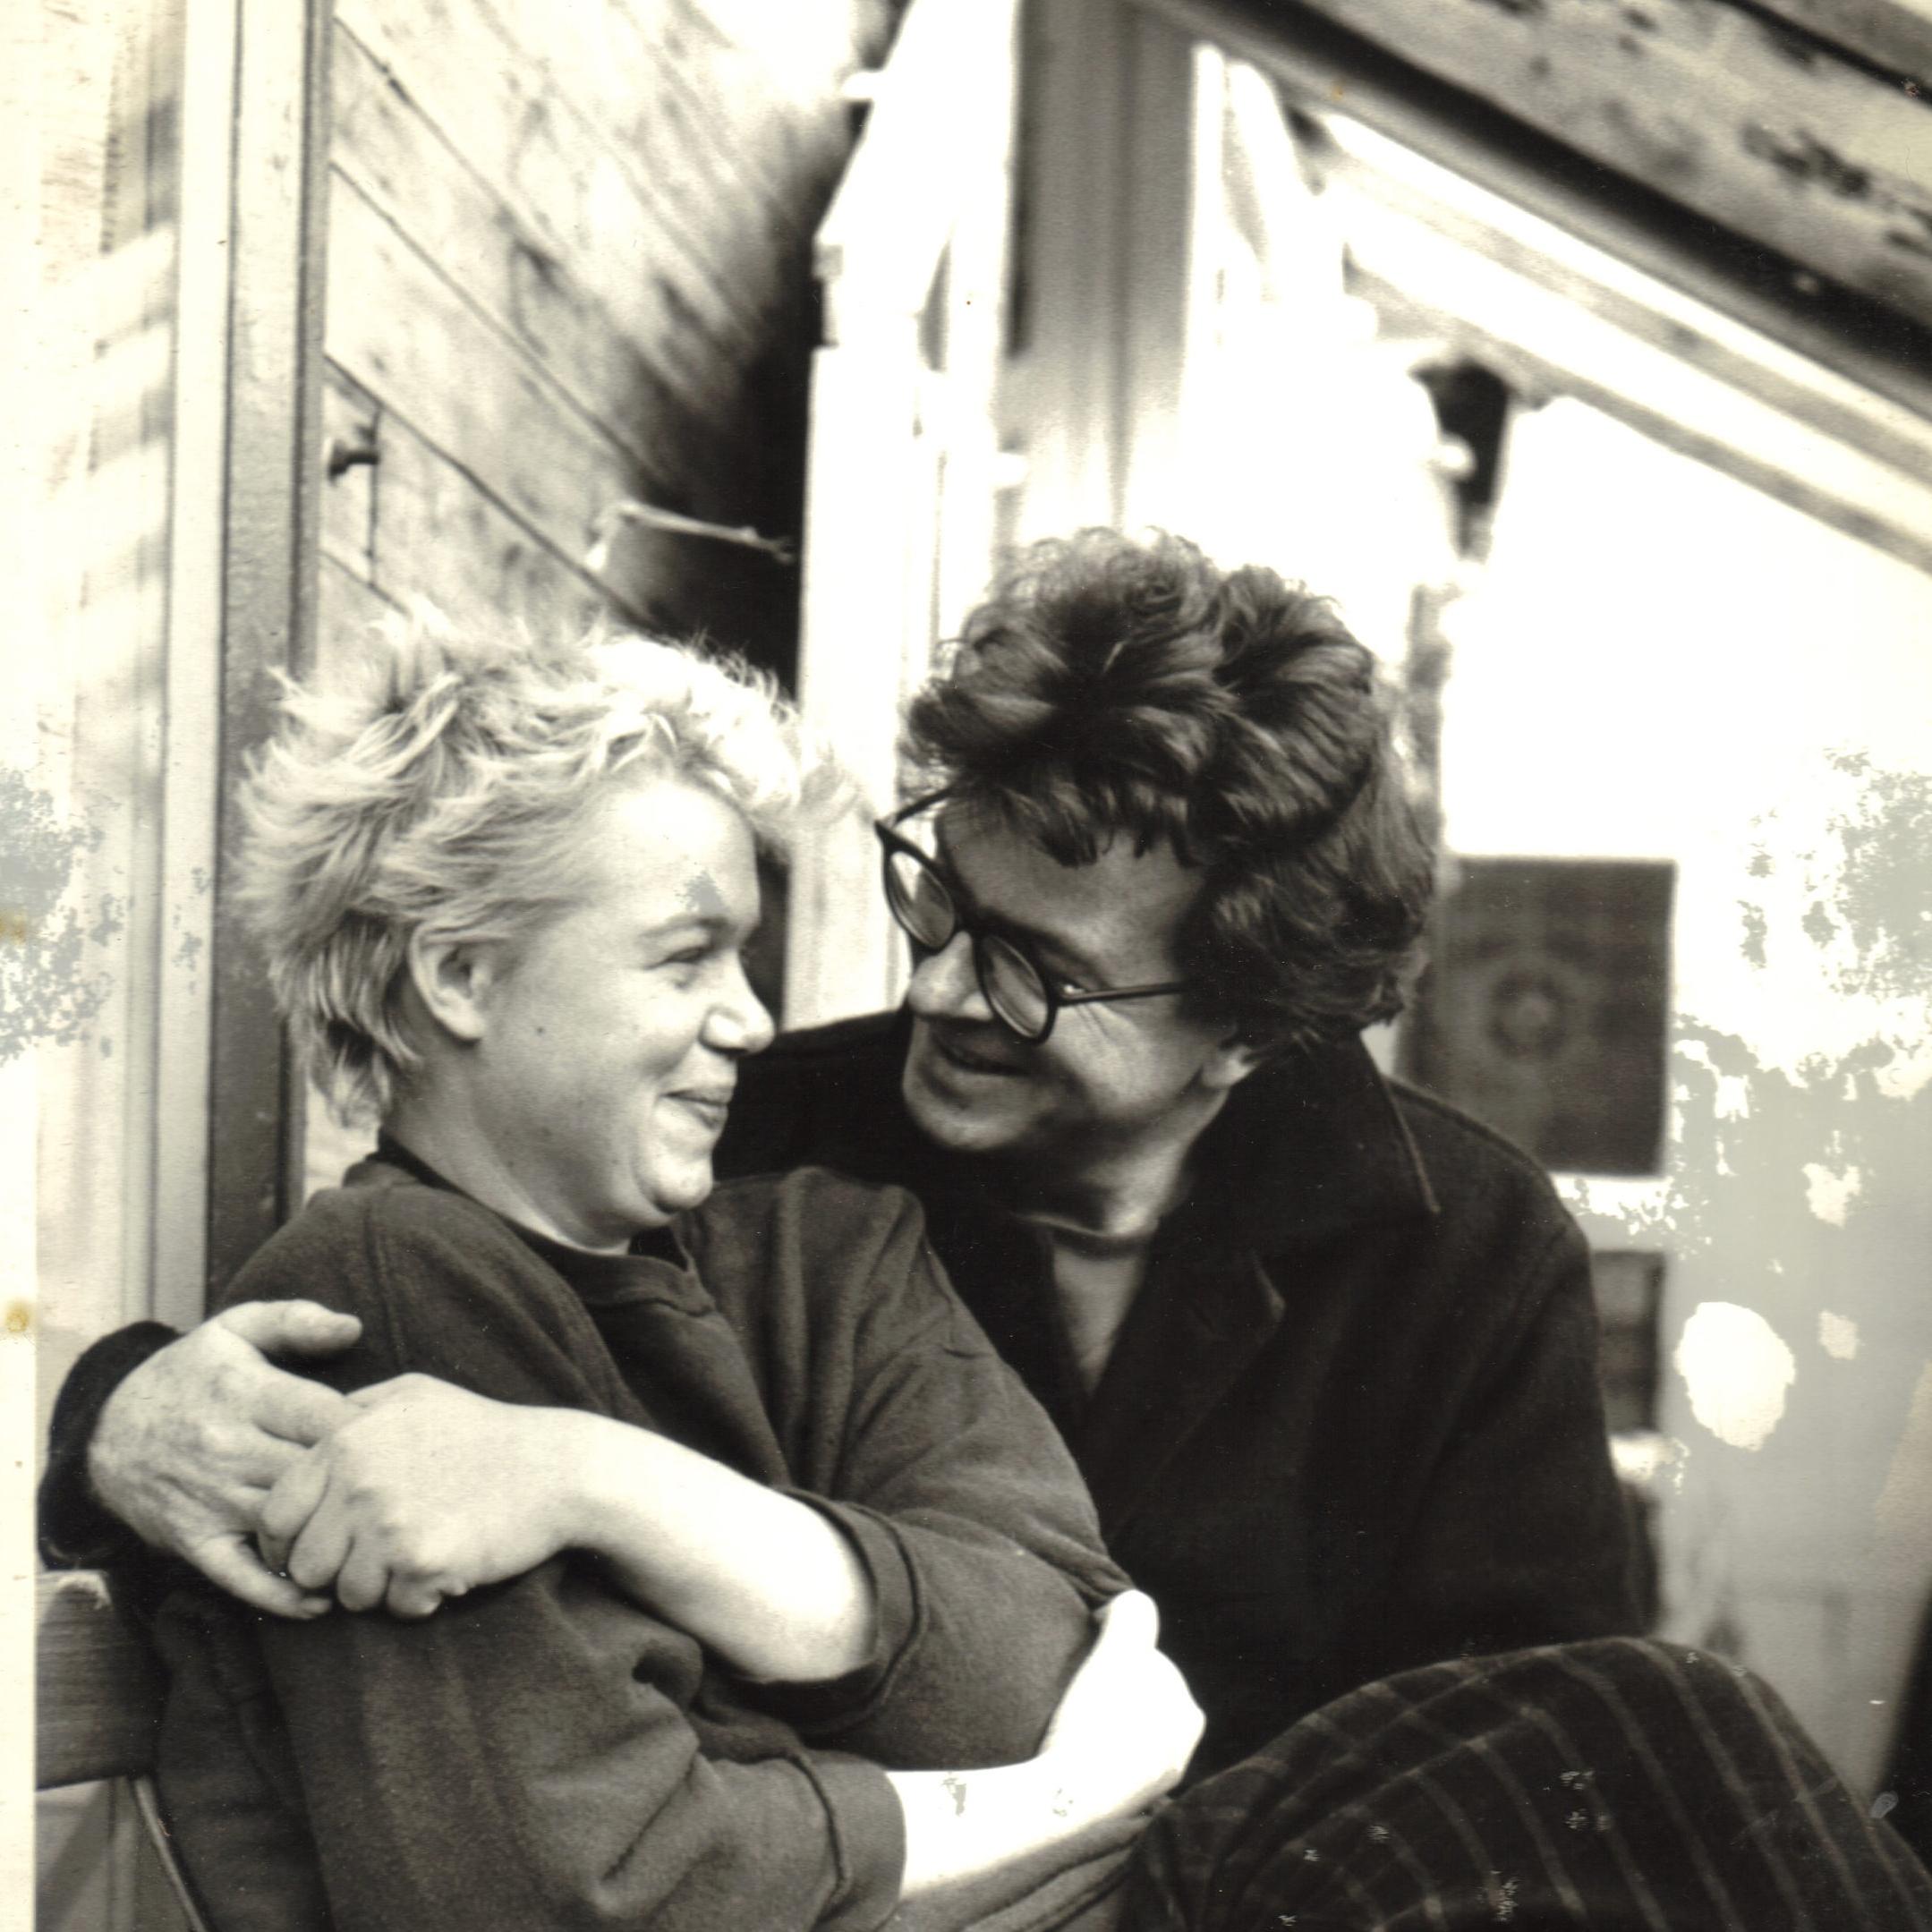 Nick and Jane Darke